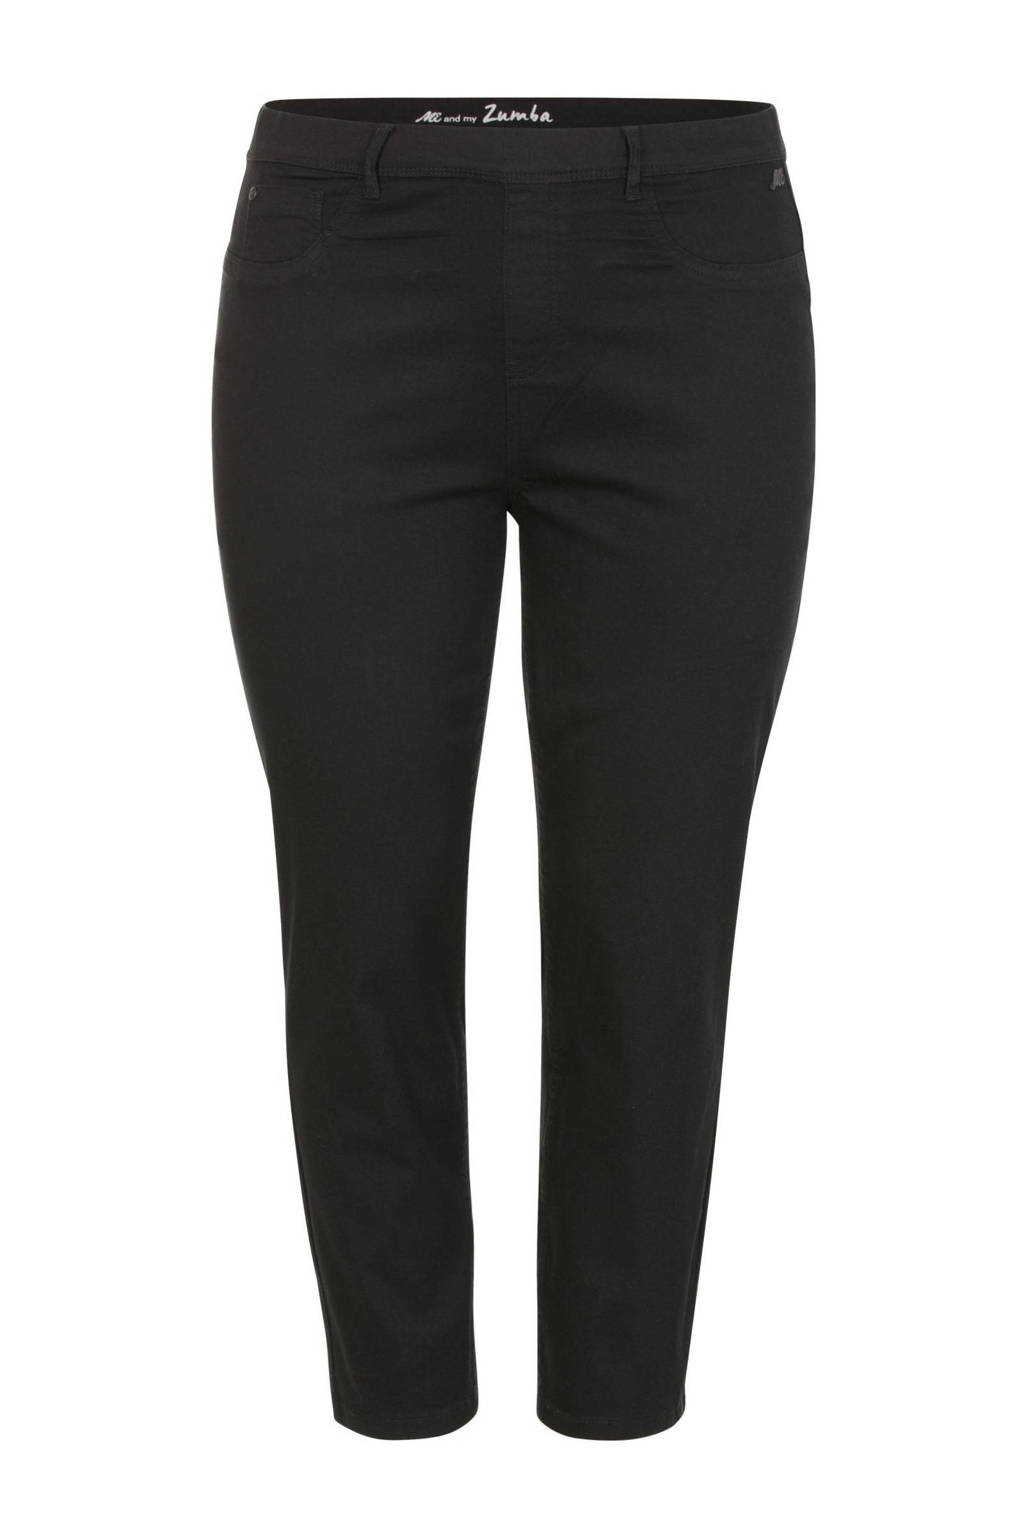 Miss Etam Plus slim fit broek zwart, Zwart